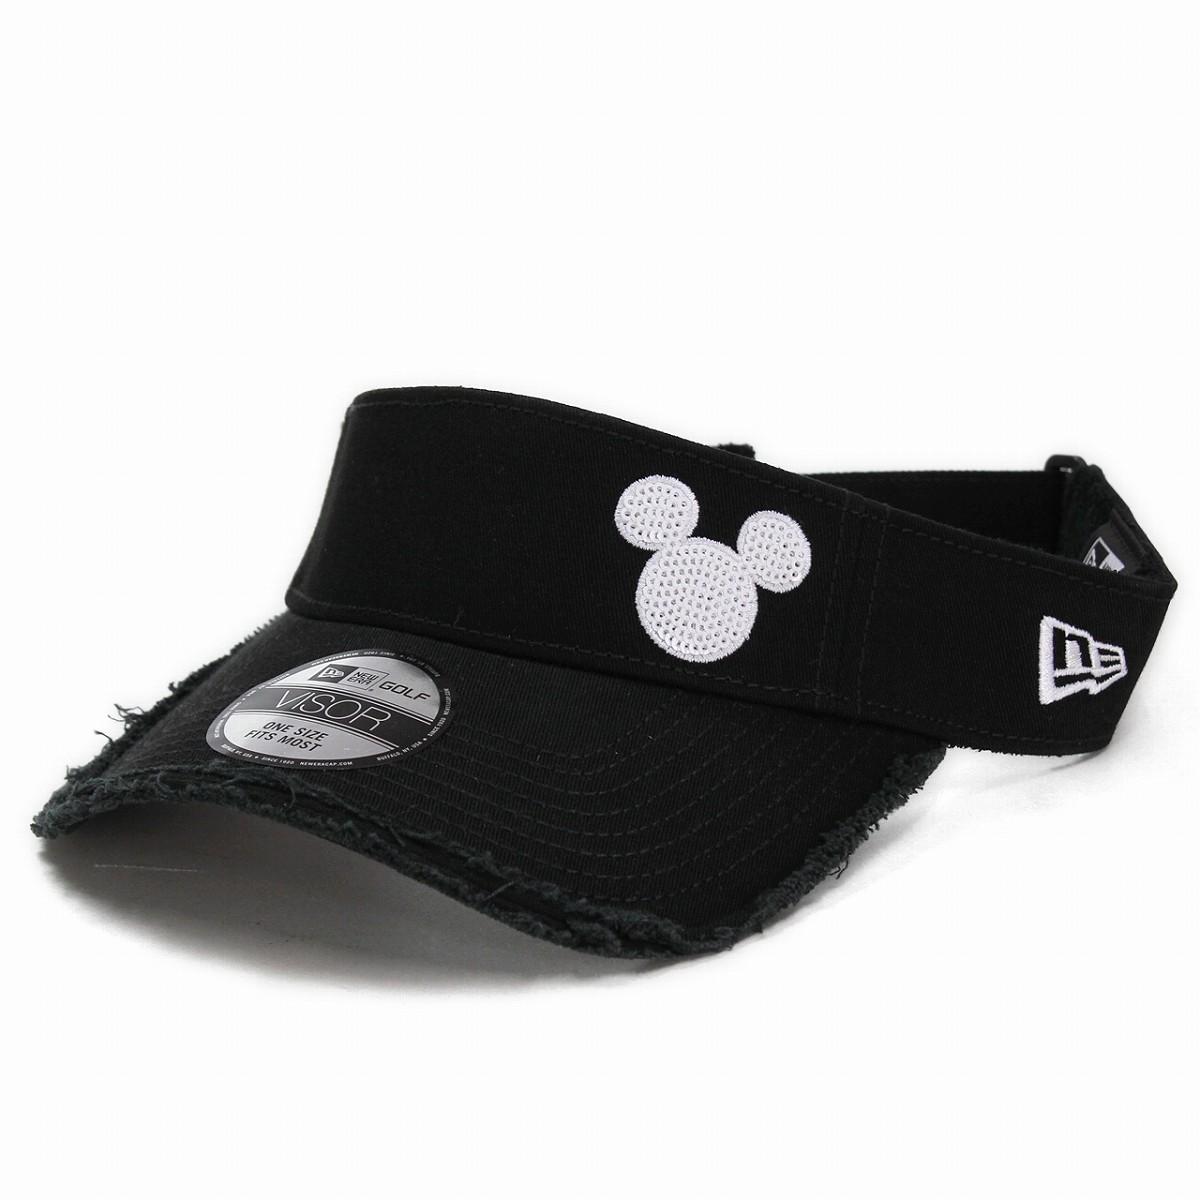 ELEHELM HAT STORE  NEWERA GOLF new gills golf sun visor Disney hat black  black Mickey  5ffc8d047a8